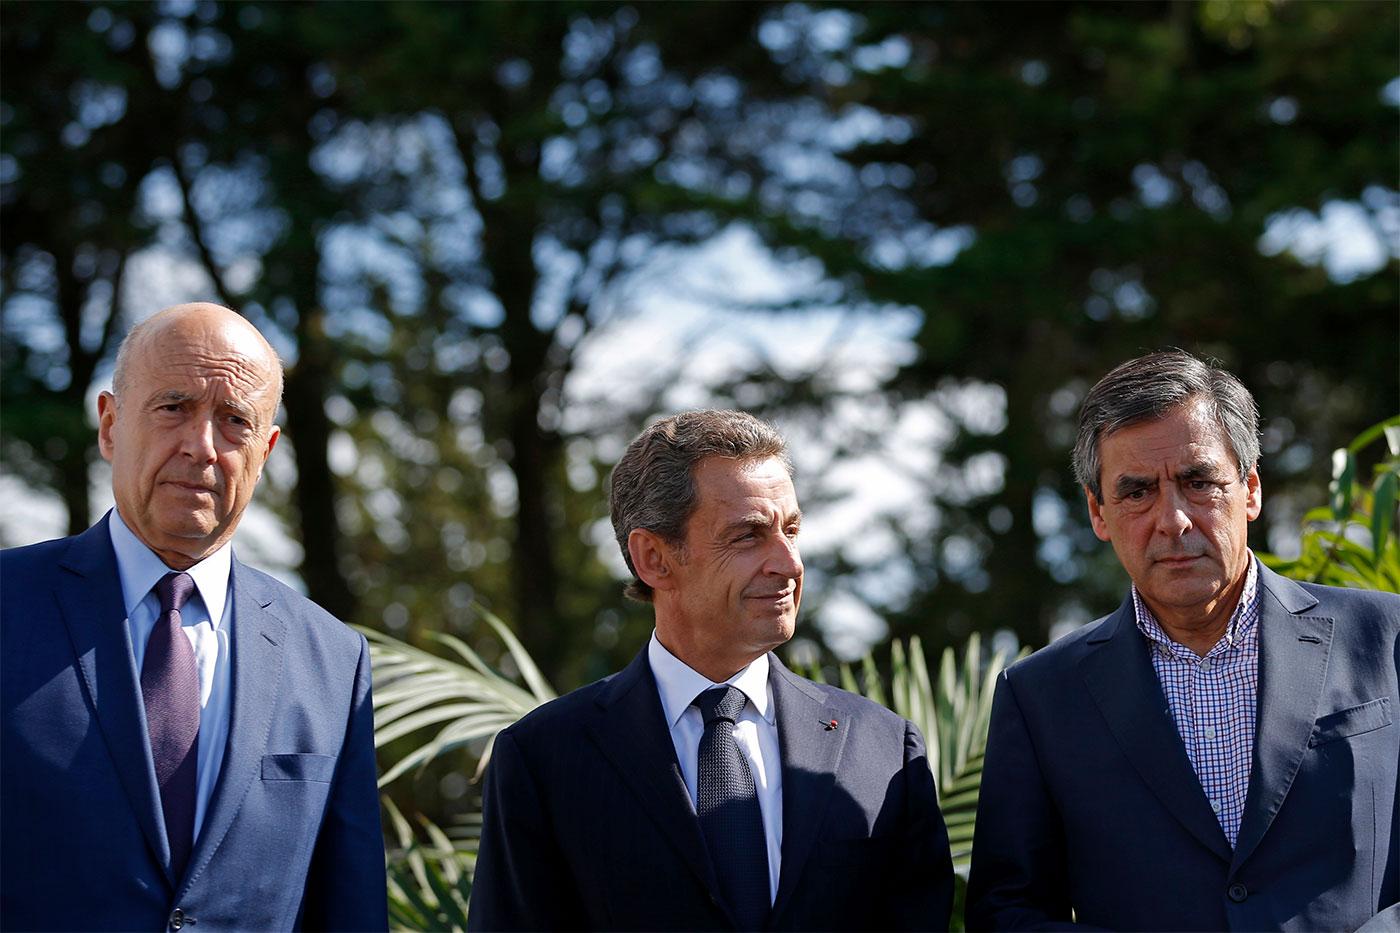 Участники право-центристских праймериз (слева направо): Ален Жюпе, Николя Саркози, Франсуа Фийон.